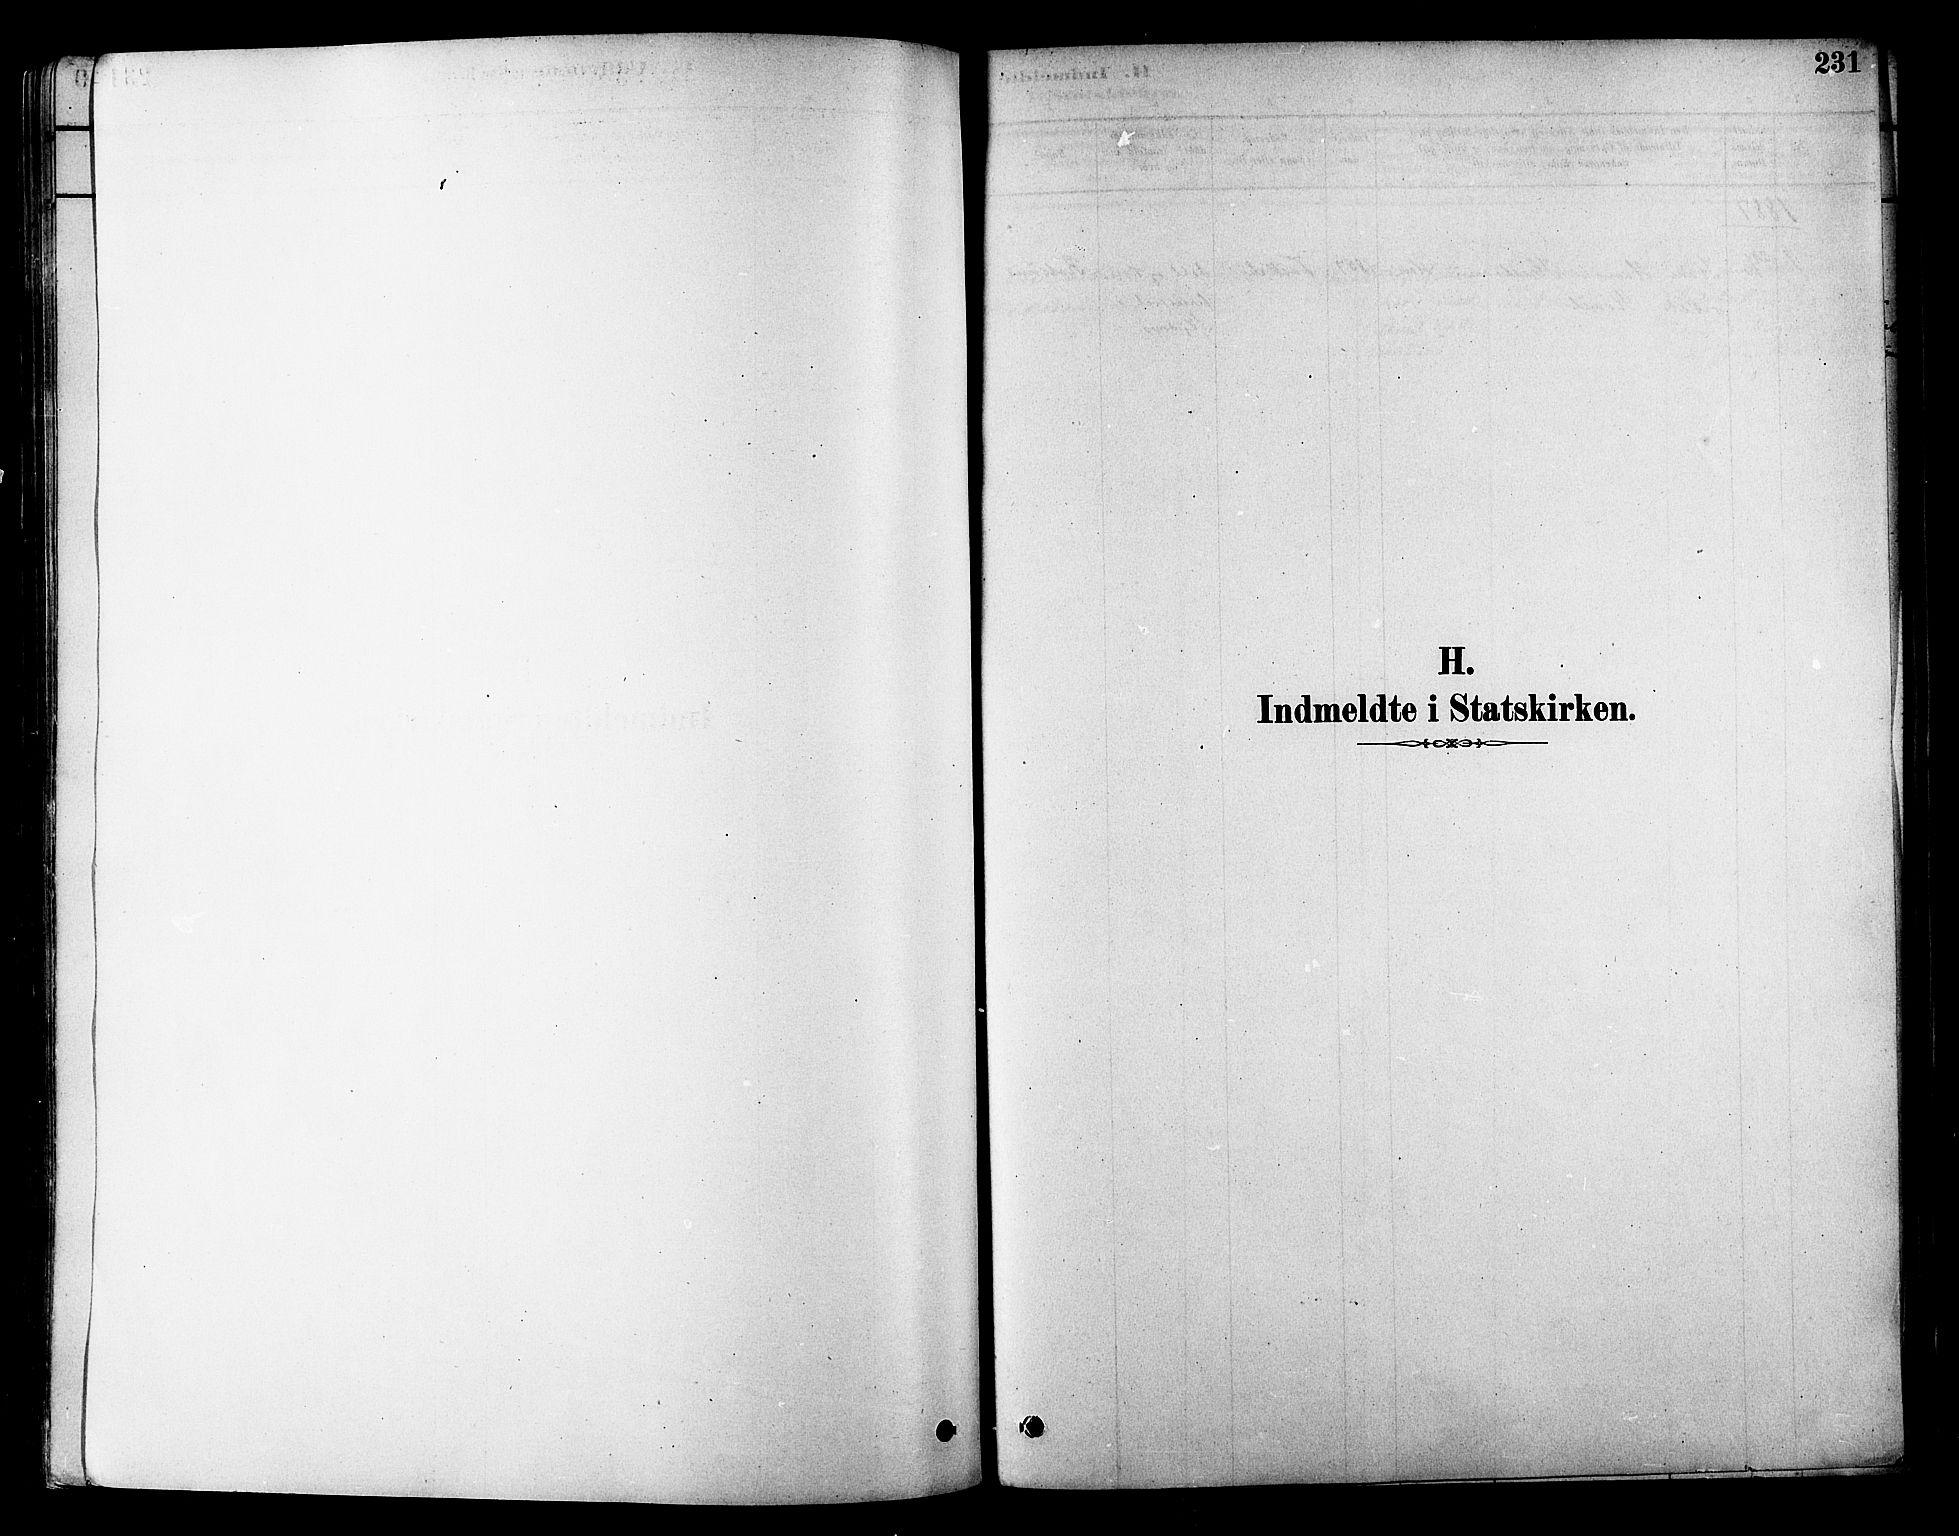 SATØ, Skjervøy sokneprestkontor, H/Ha/Haa/L0009kirke: Ministerialbok nr. 9, 1878-1887, s. 231